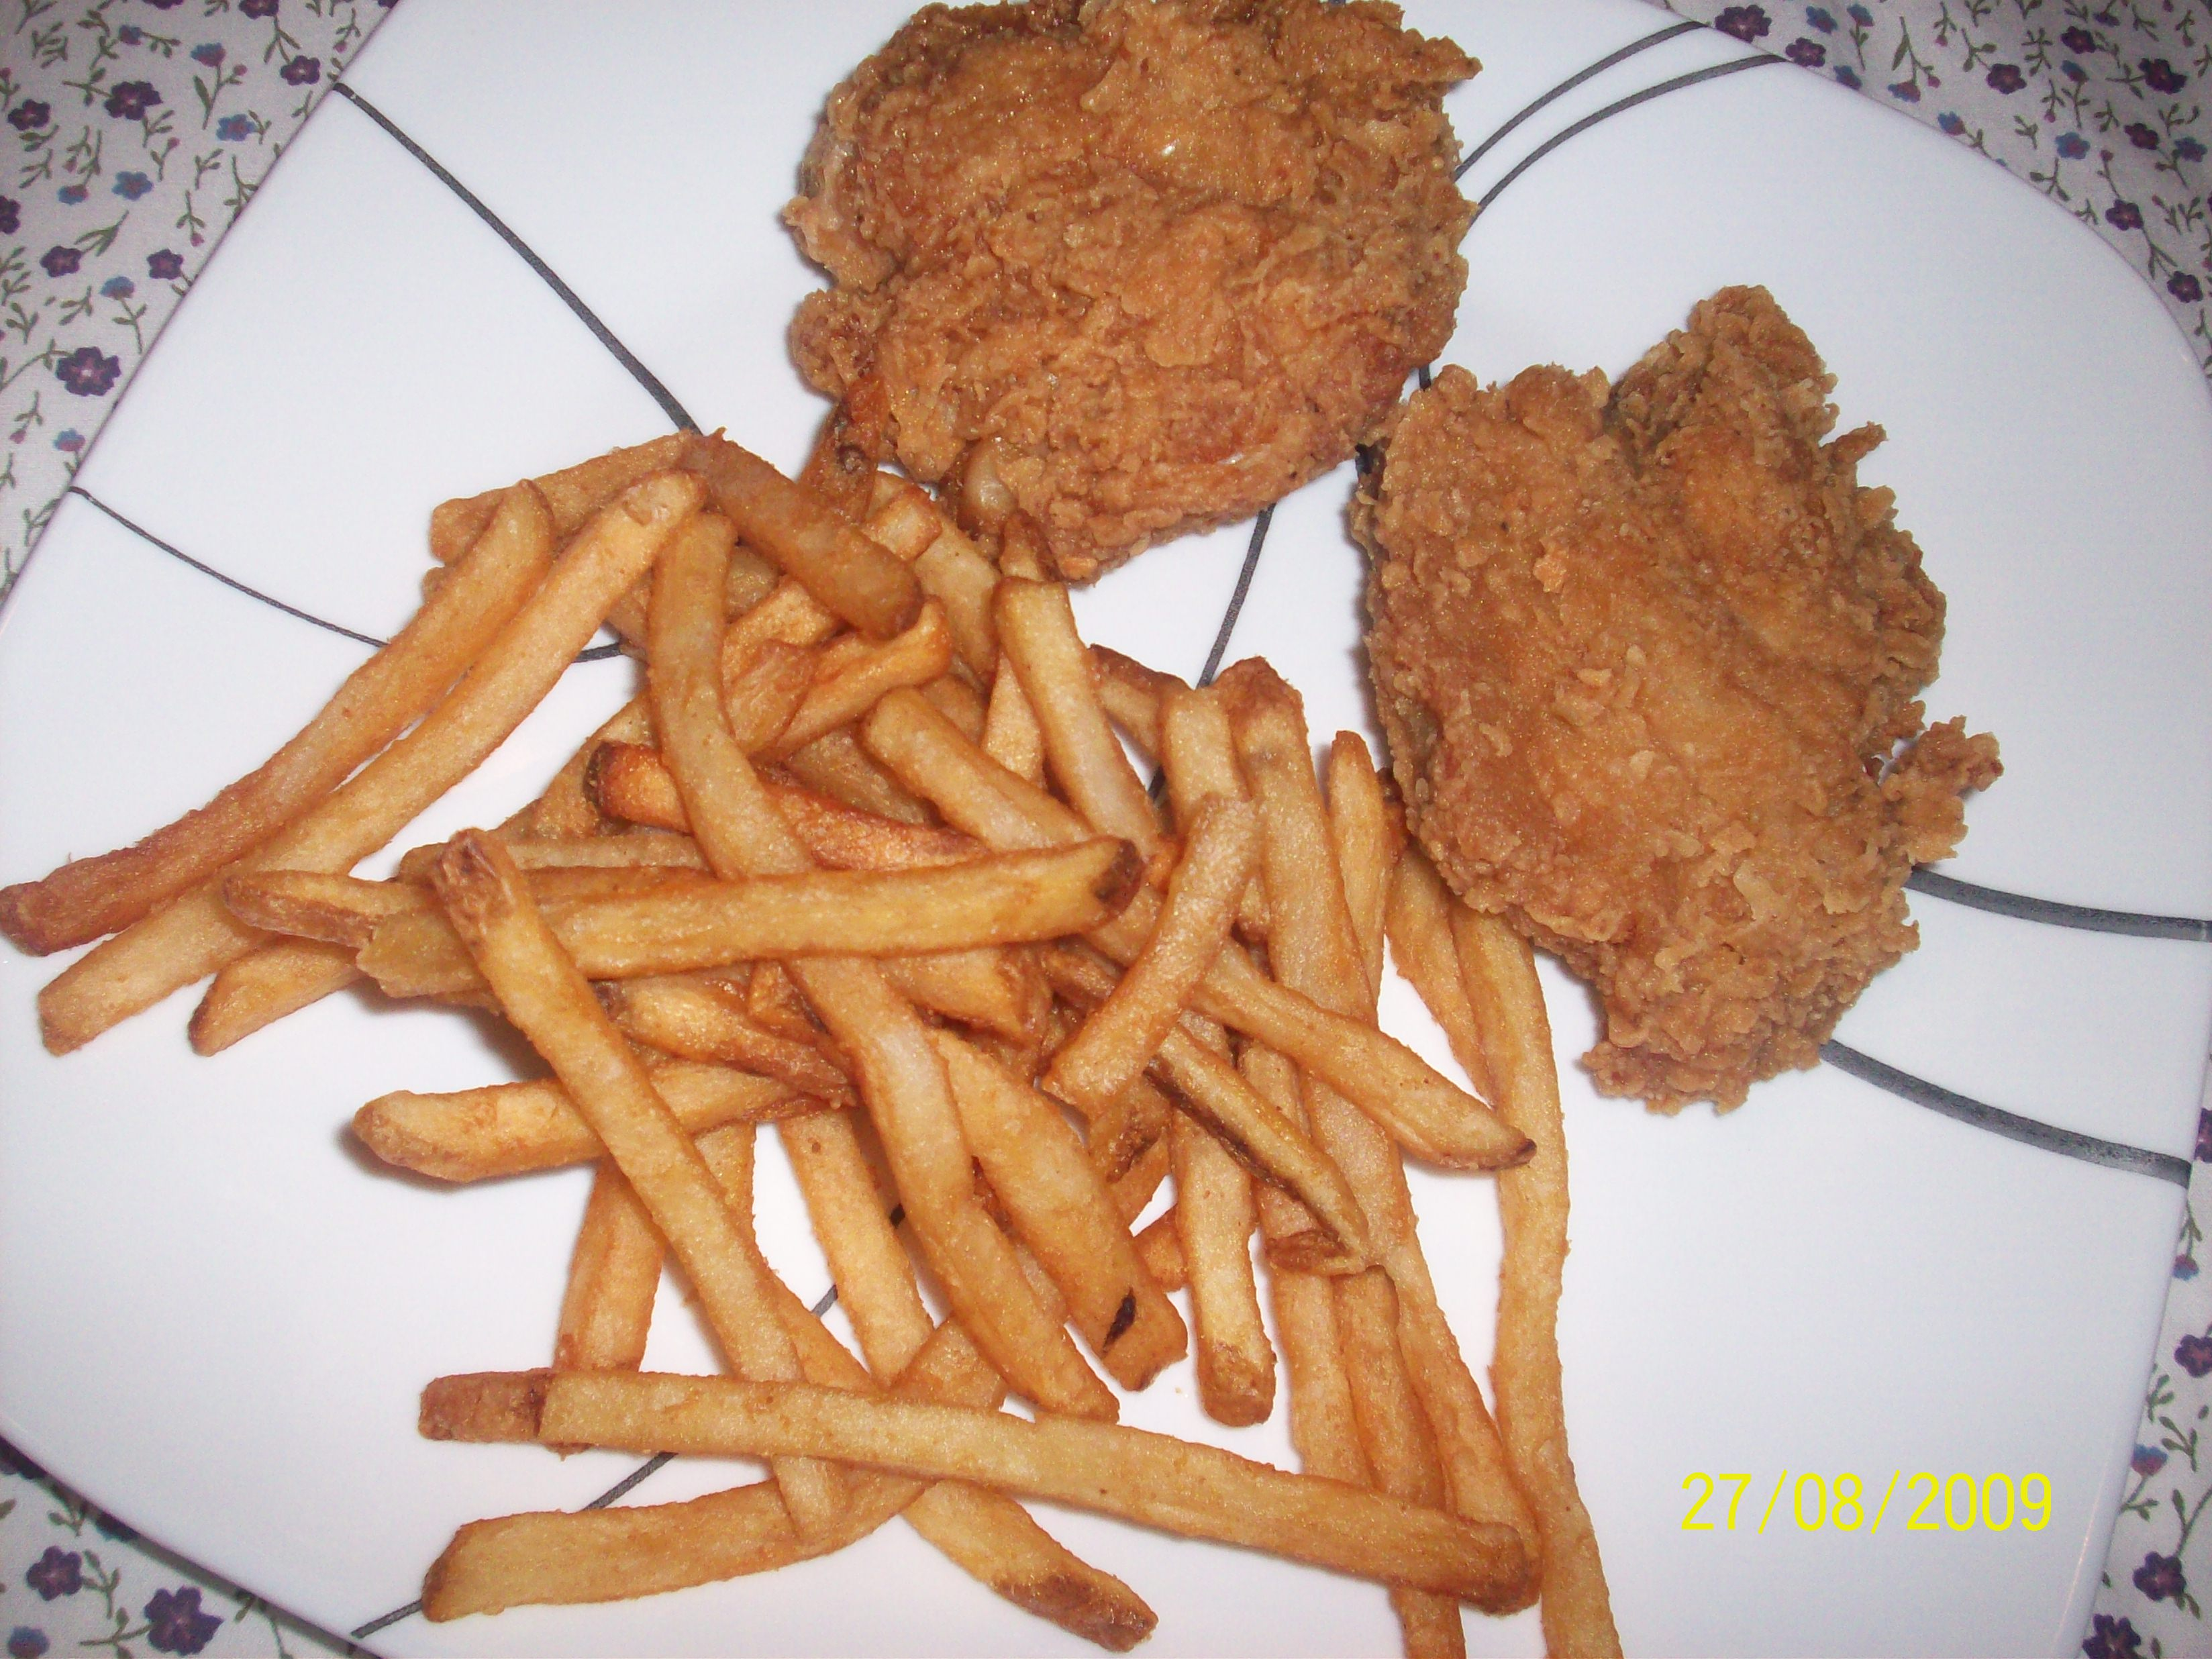 http://foodloader.net/cutie_2009-08-27_KFC_Chicken_and_Fries.jpg